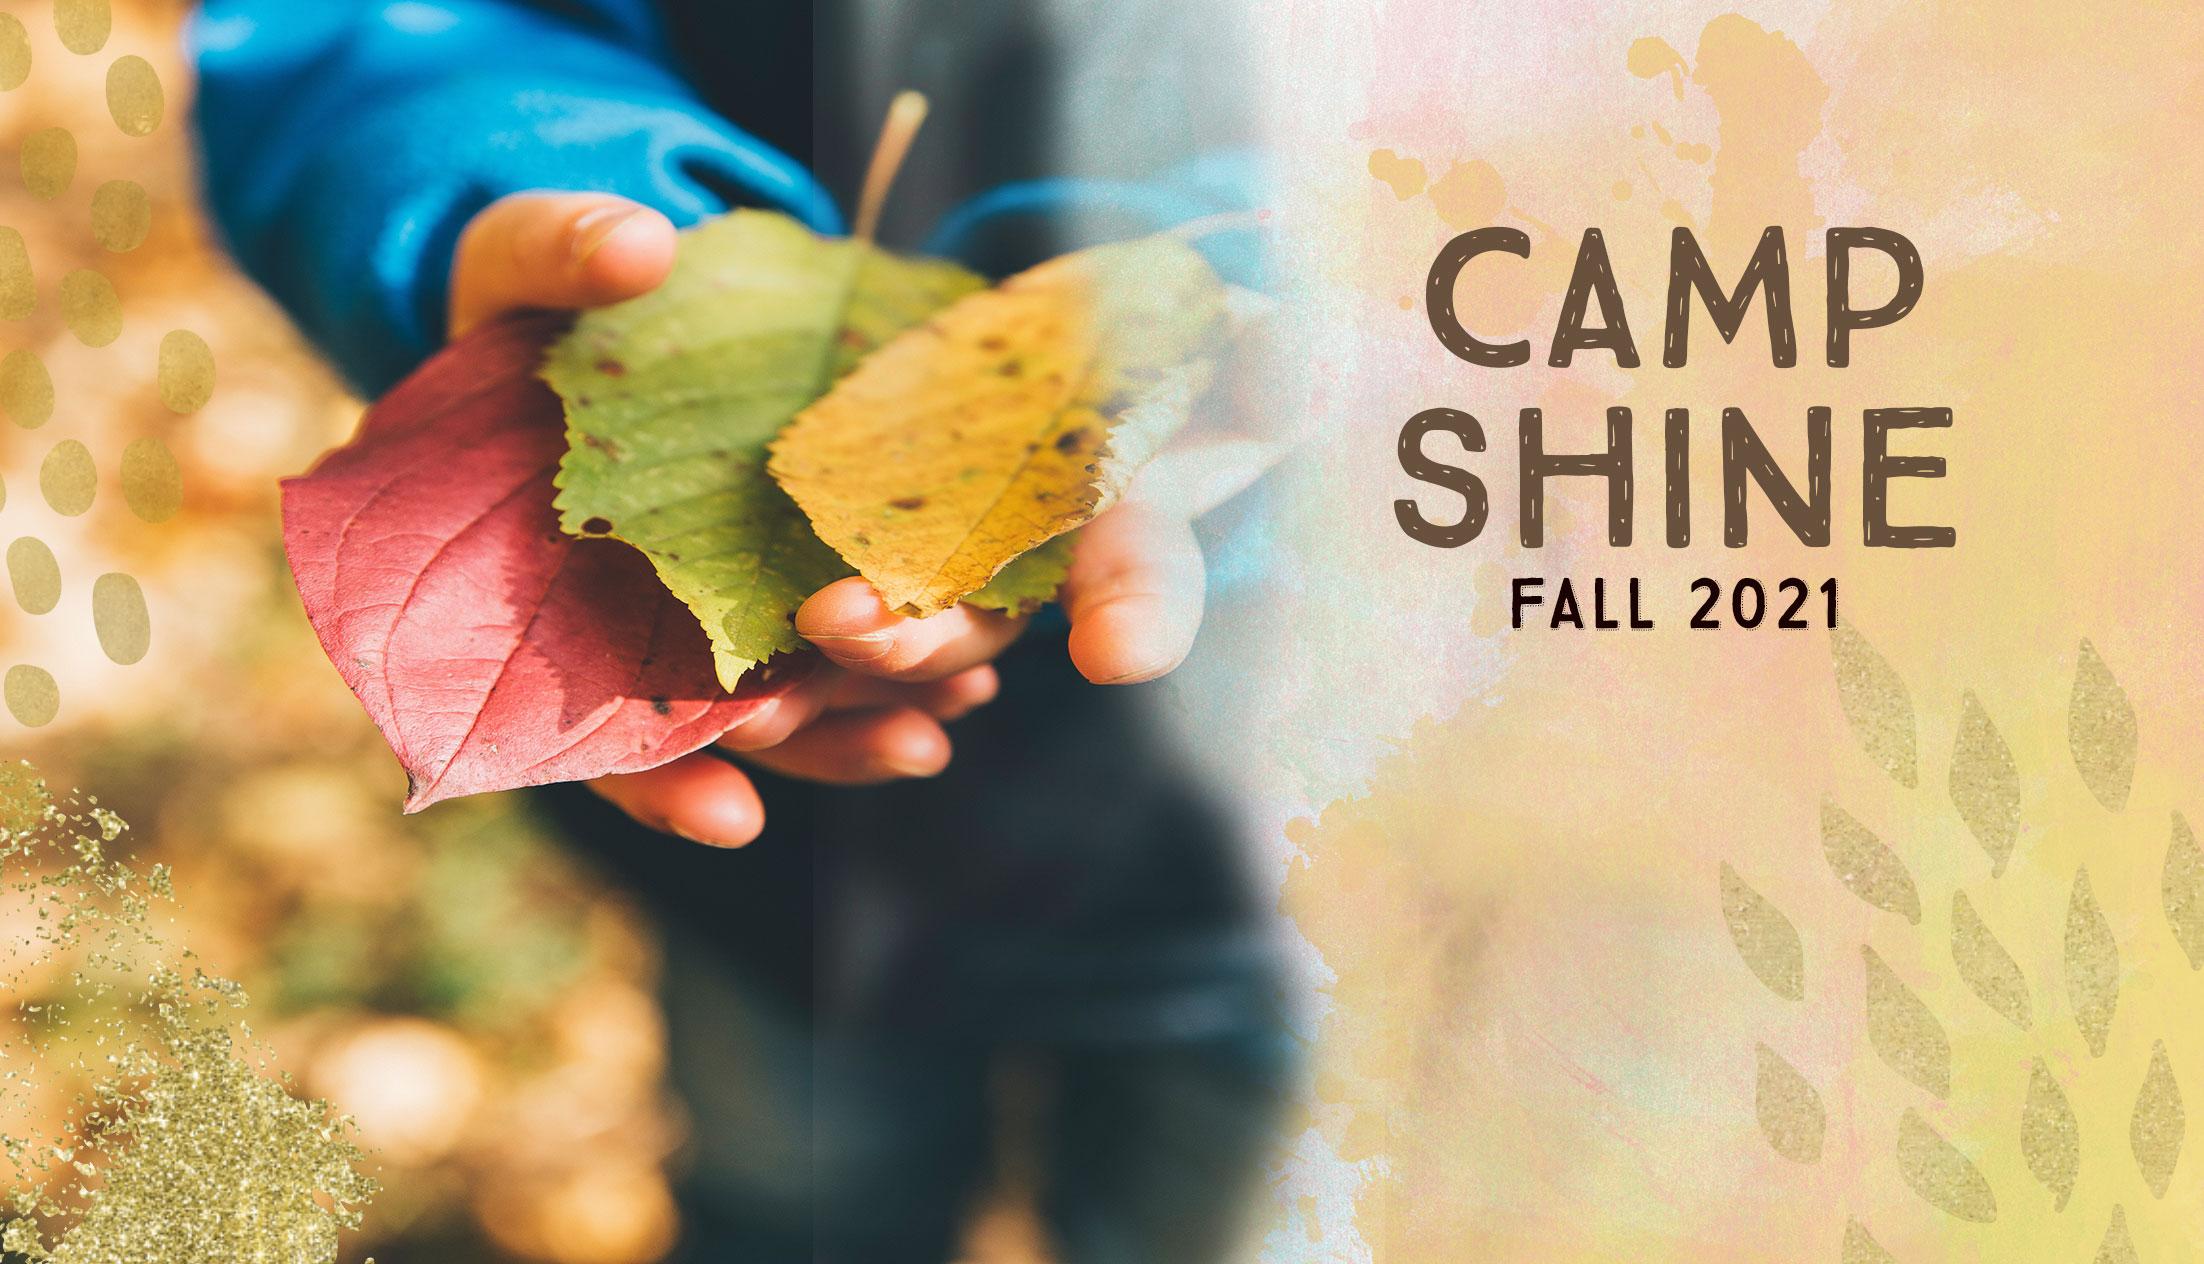 Camp SHINE Fall 2021